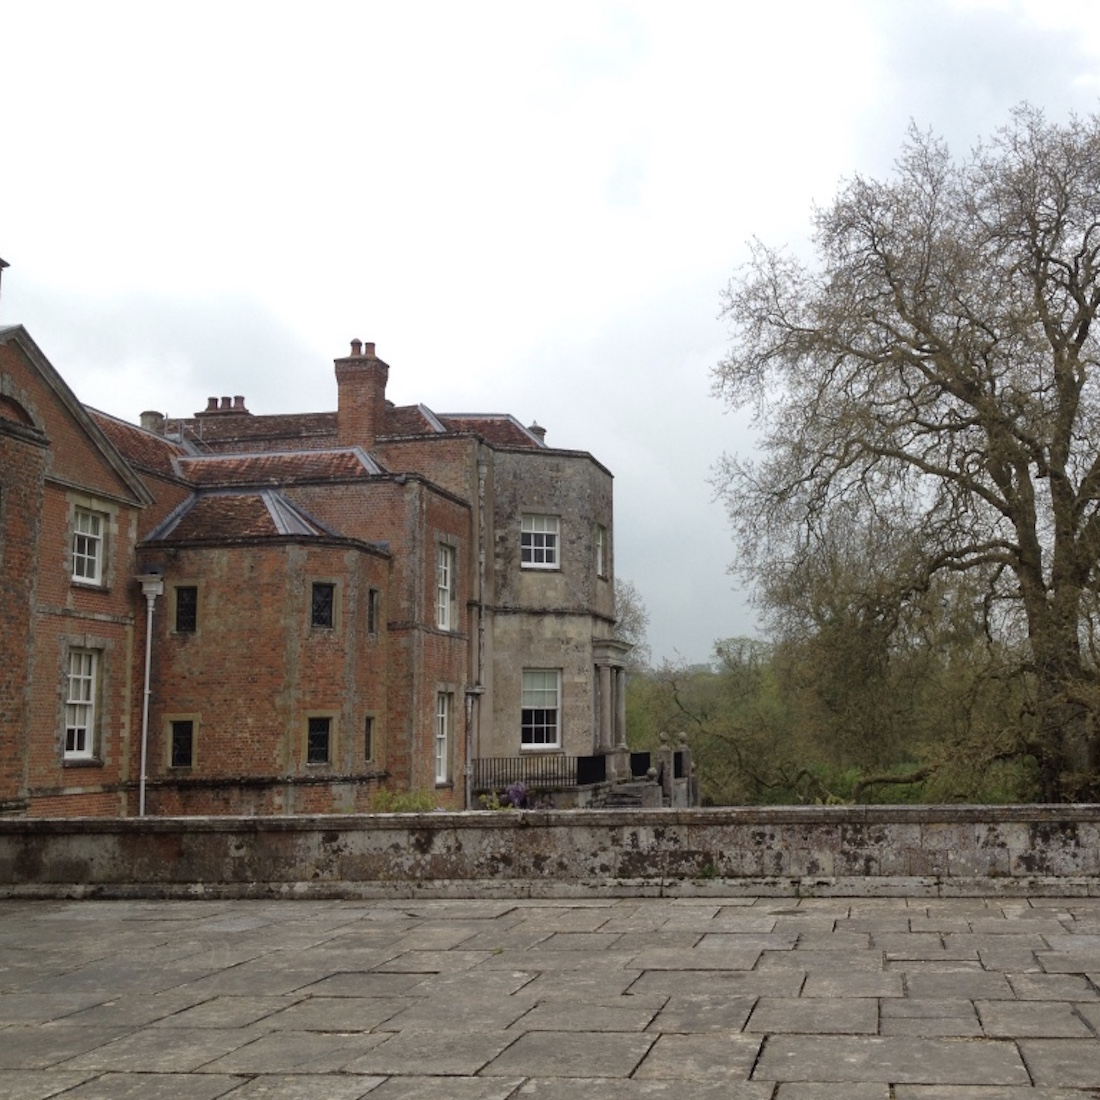 Mottisfont Abbey Terrace